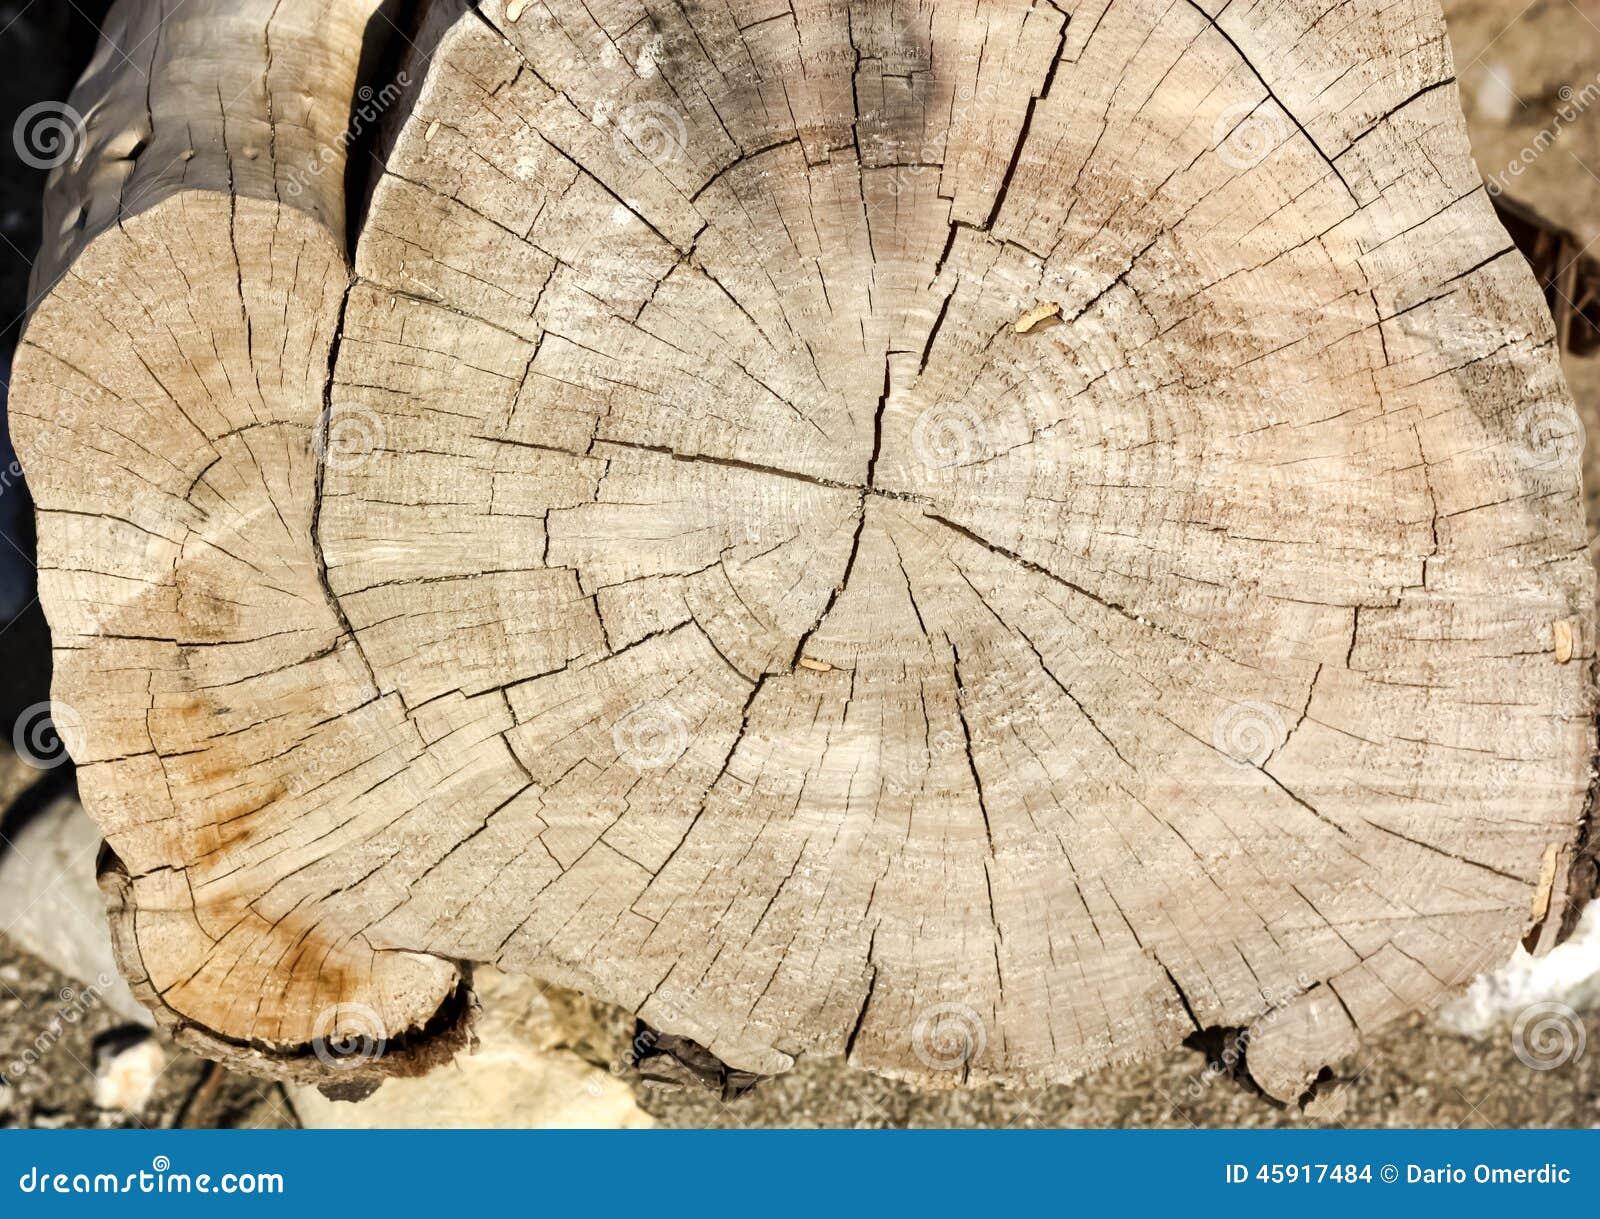 Eucalyptus Ring Of Death